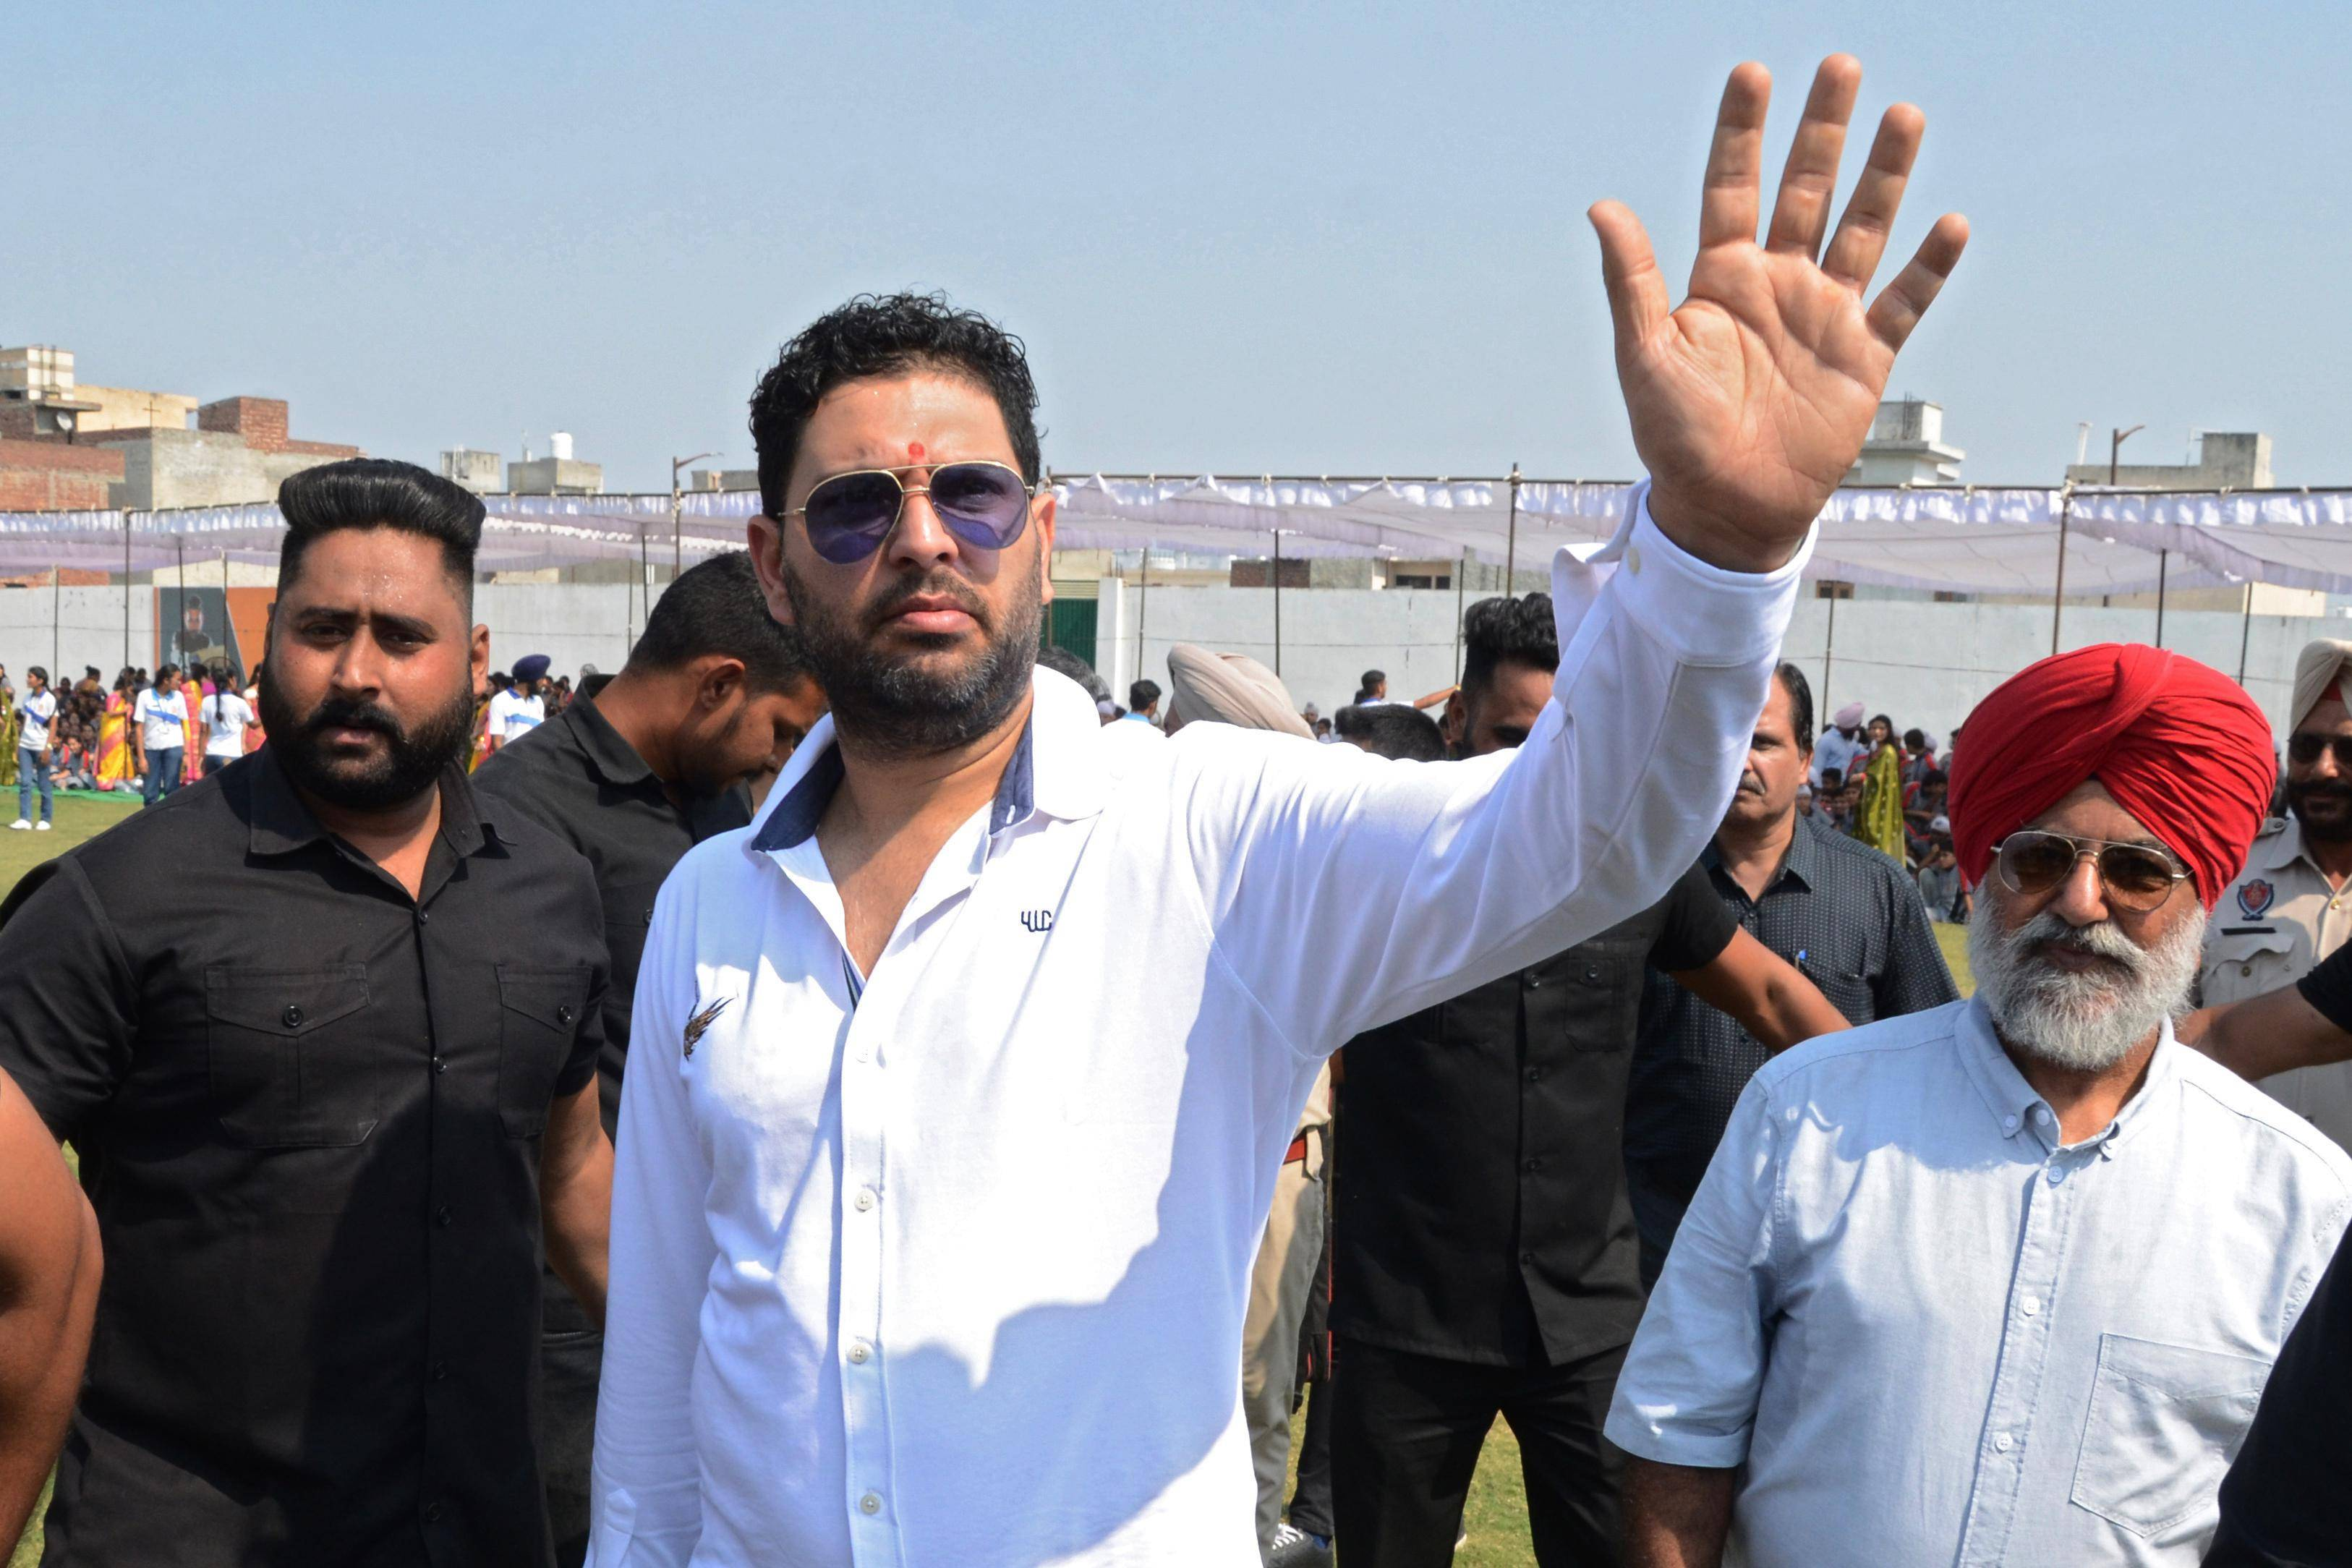 Cricketer Yuvraj Singh arrested, released on bail over casteist remarks